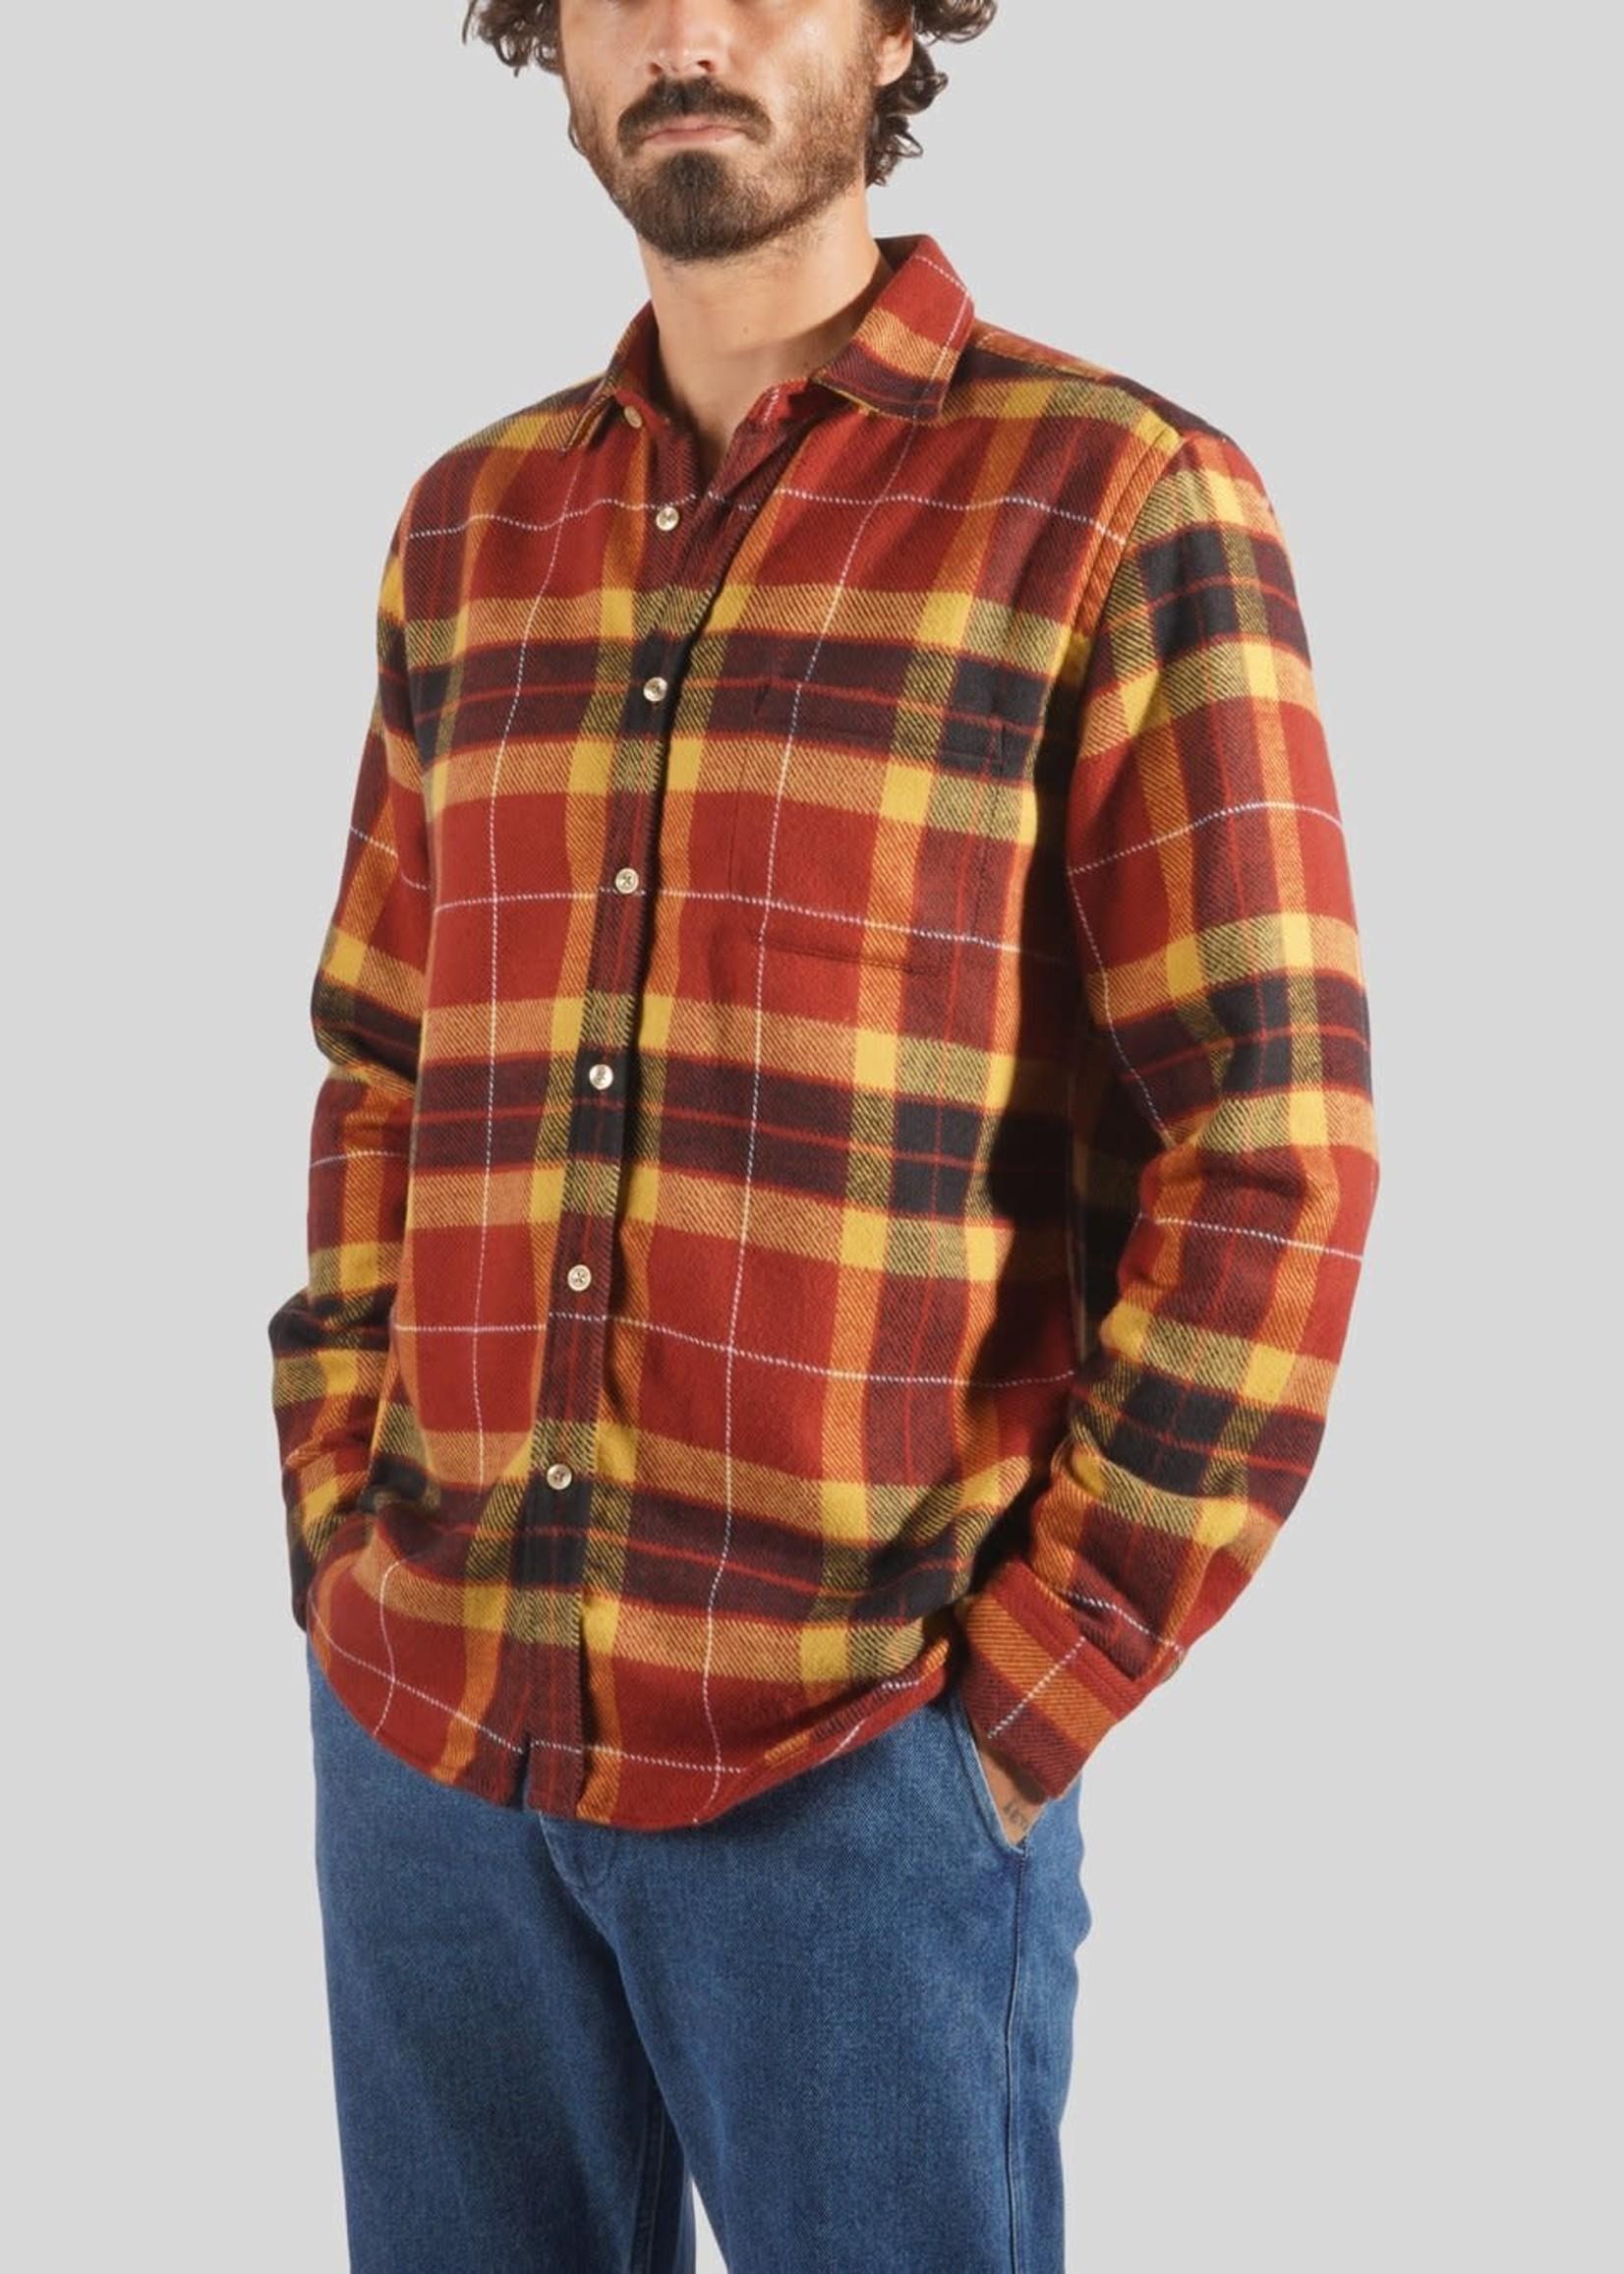 Portuguese Flannel Portuguese Flannel Baviera Red Yellow Plaid Sport Shirt